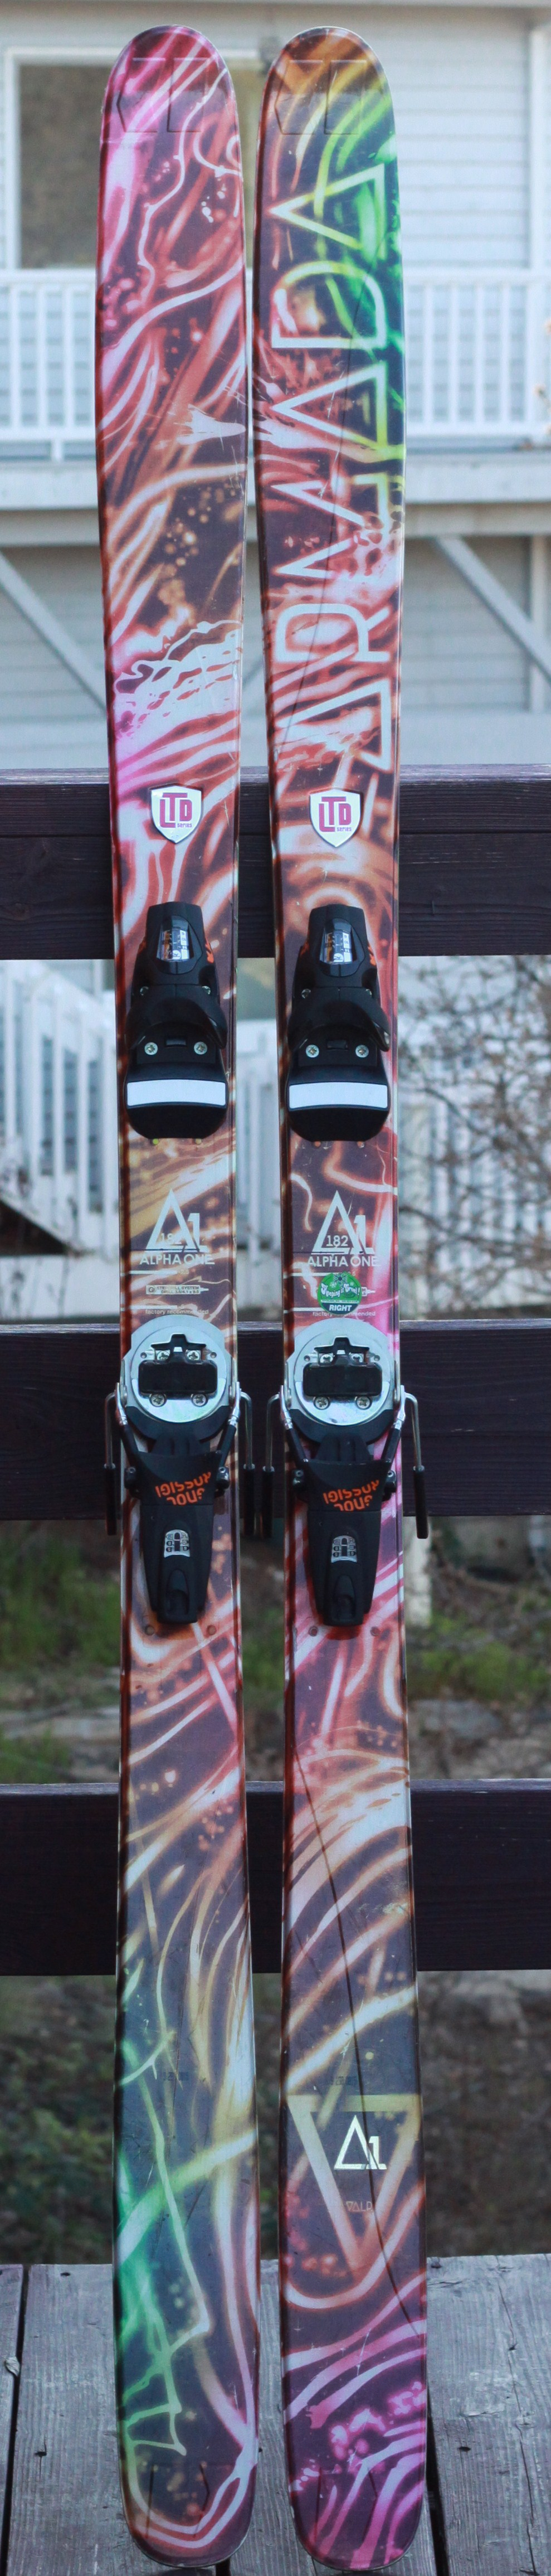 Armada Skis - 1 of 13